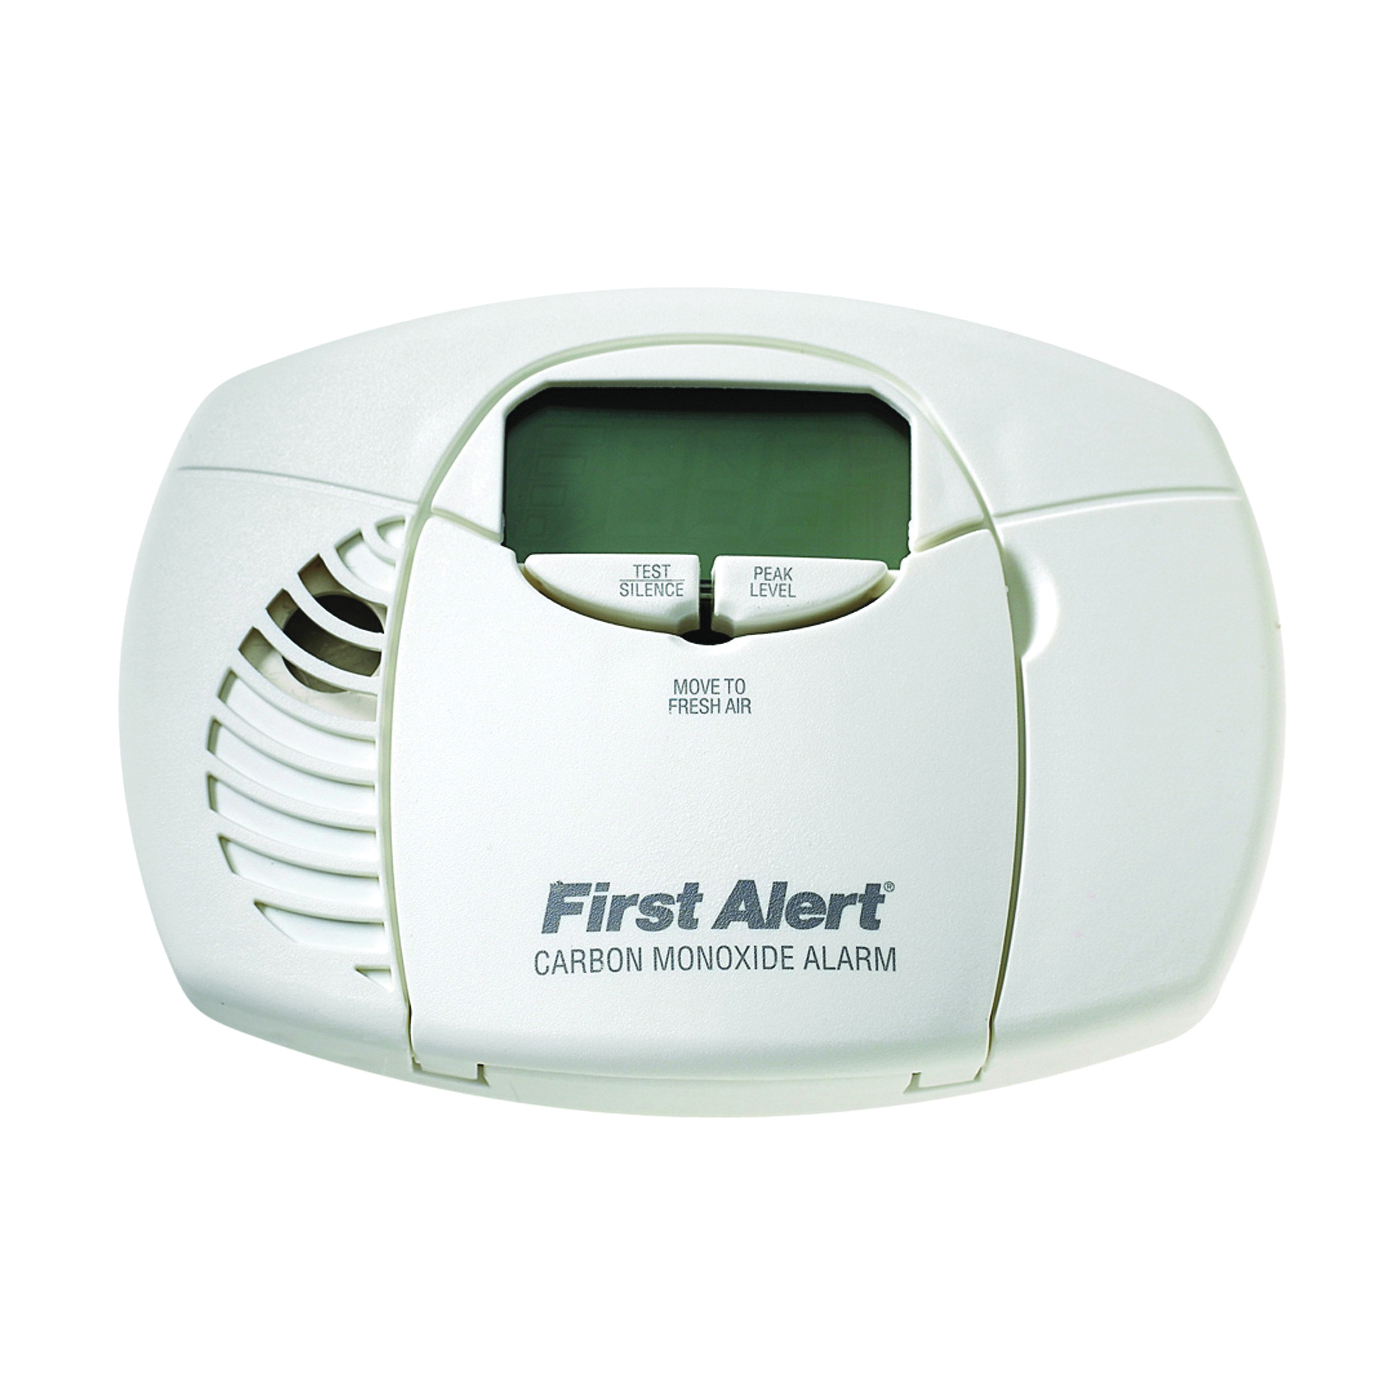 Picture of FIRST ALERT CO410 Carbon Monoxide Alarm, 10 ft, Digital Display, 85 dB, Alarm: Audible, Electrochemical Sensor